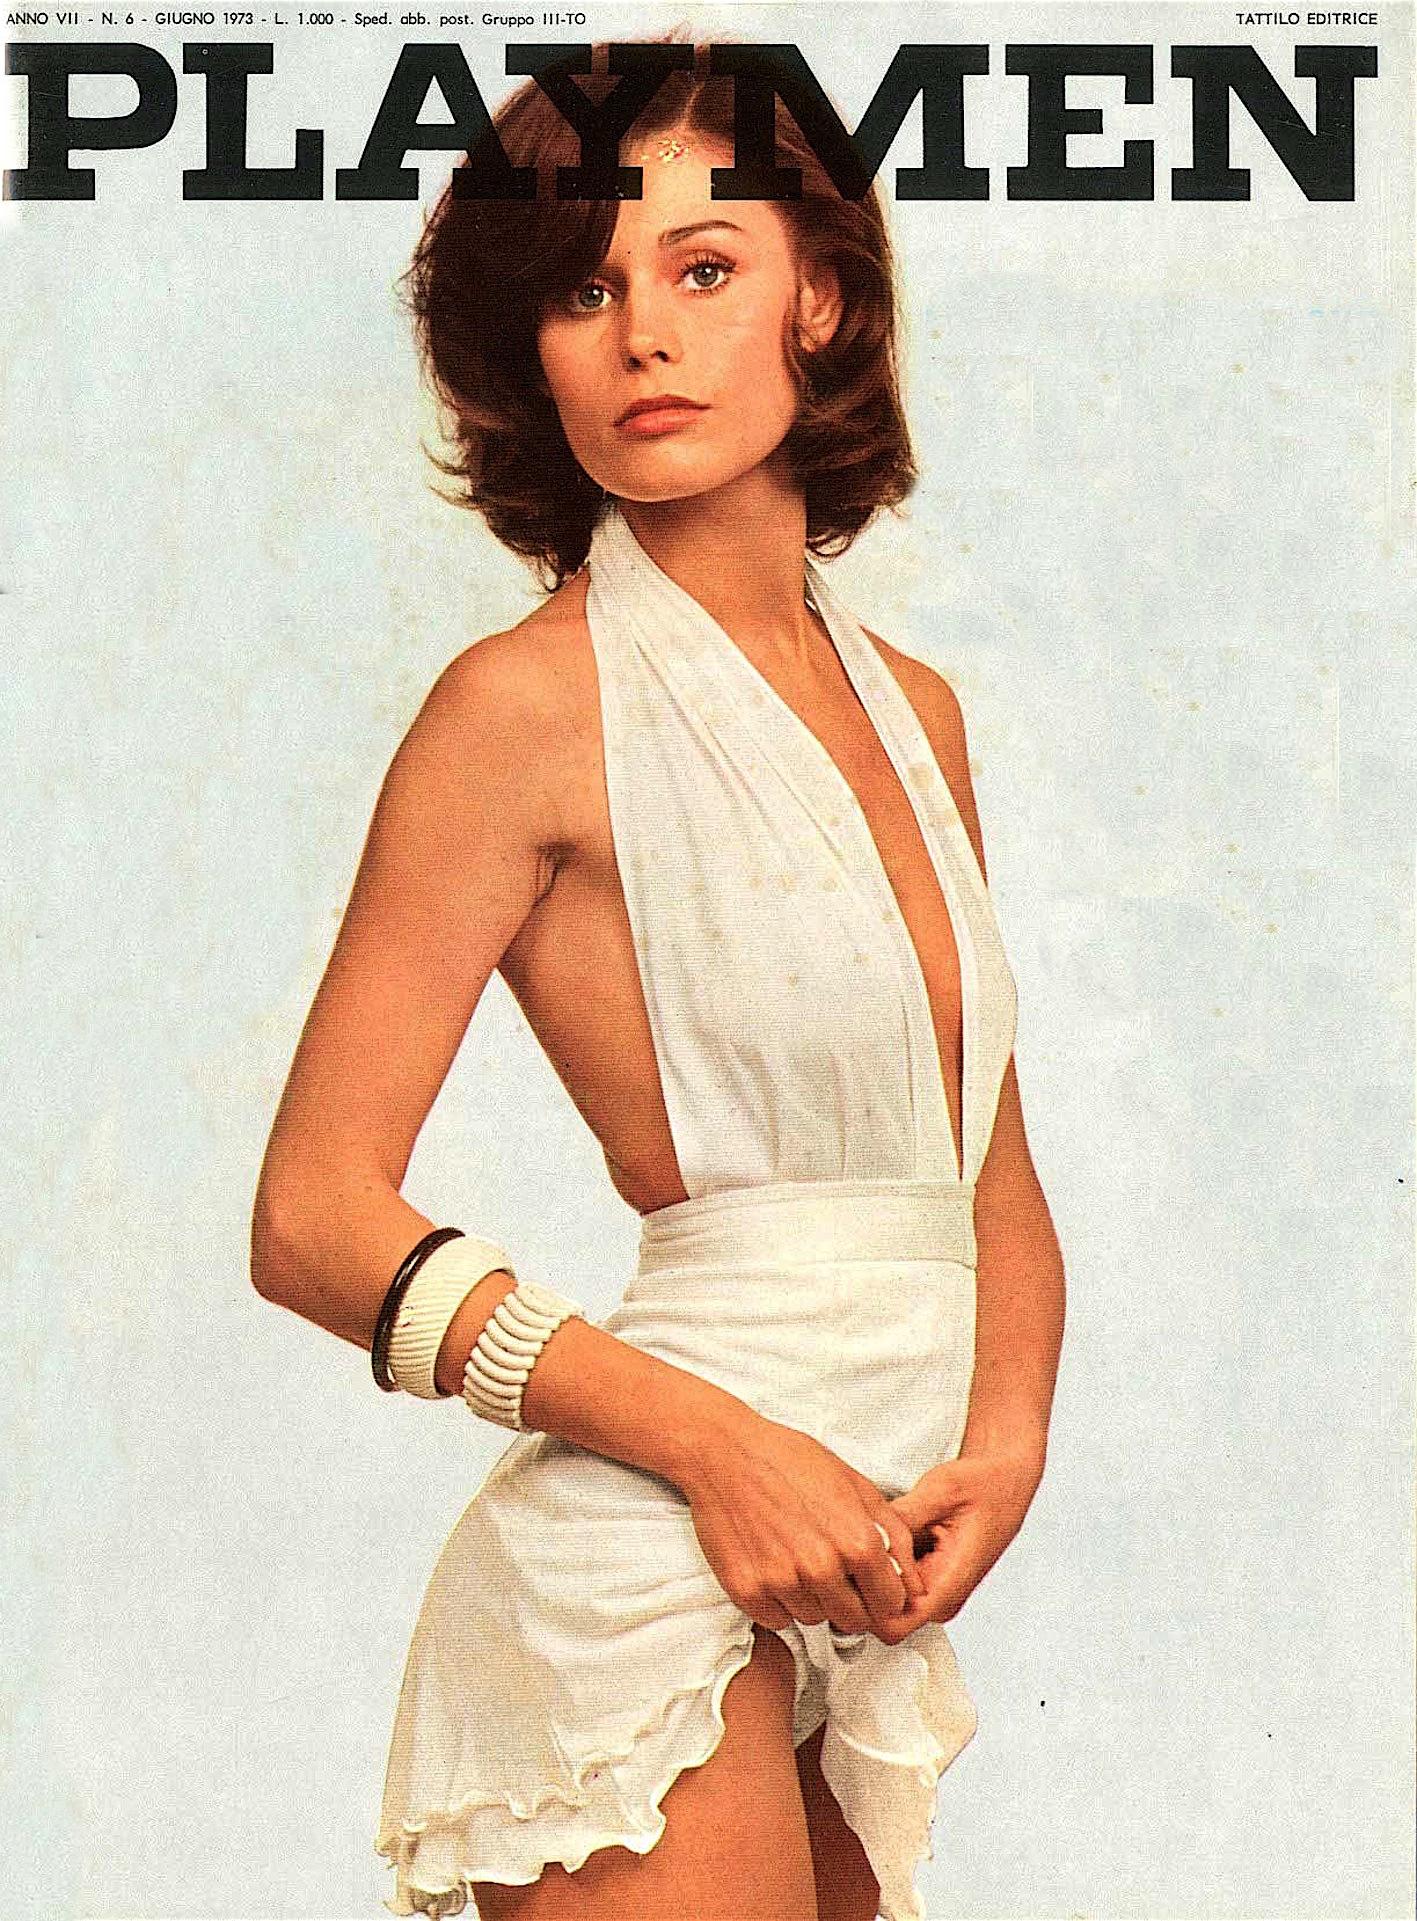 corinne_clery_PLAYMEN-1973